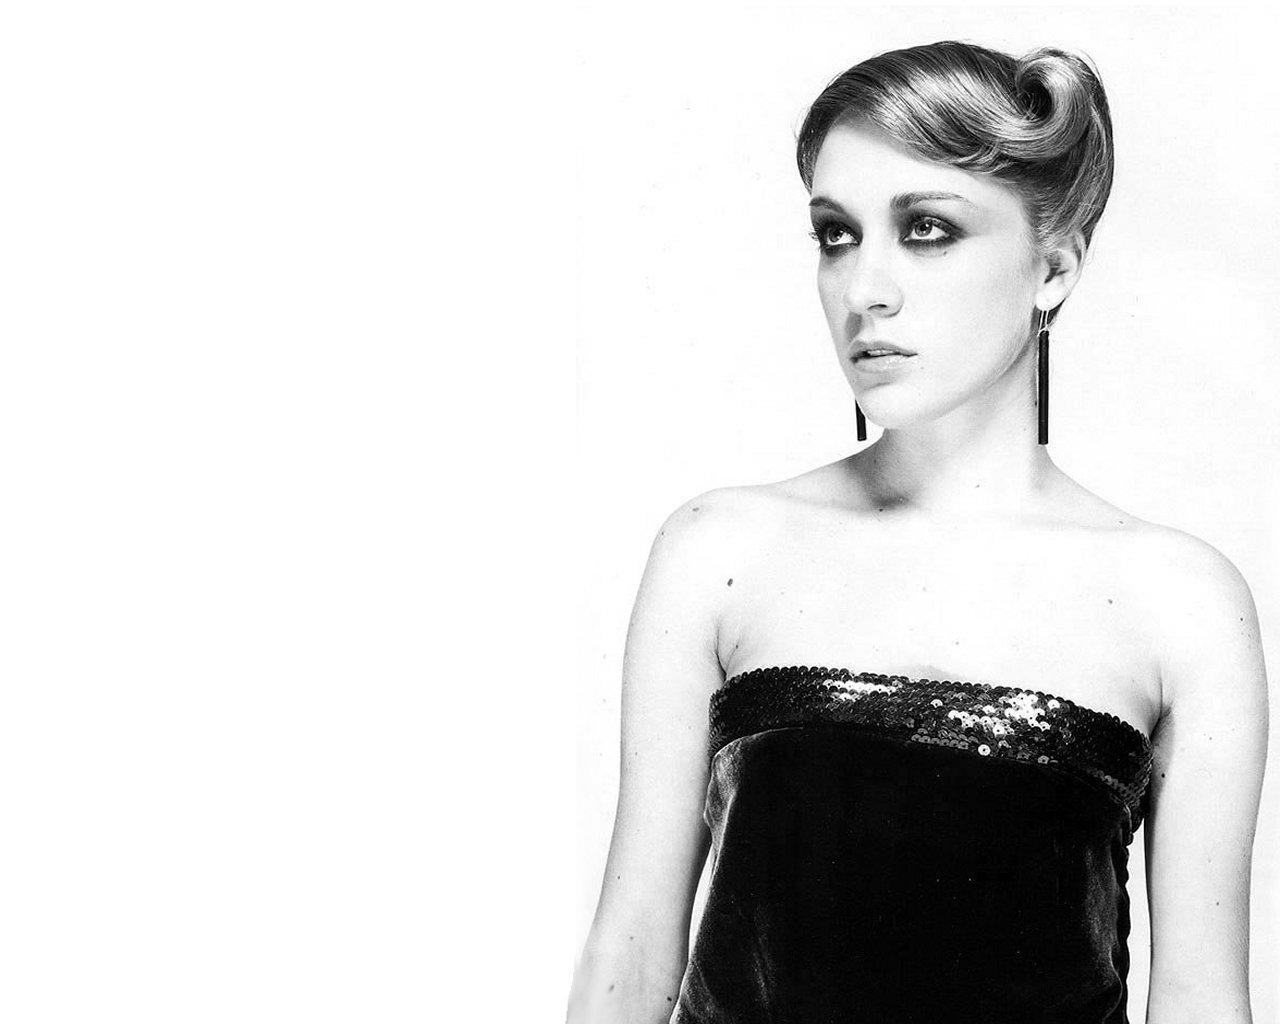 Chloe sevigny black and white photos